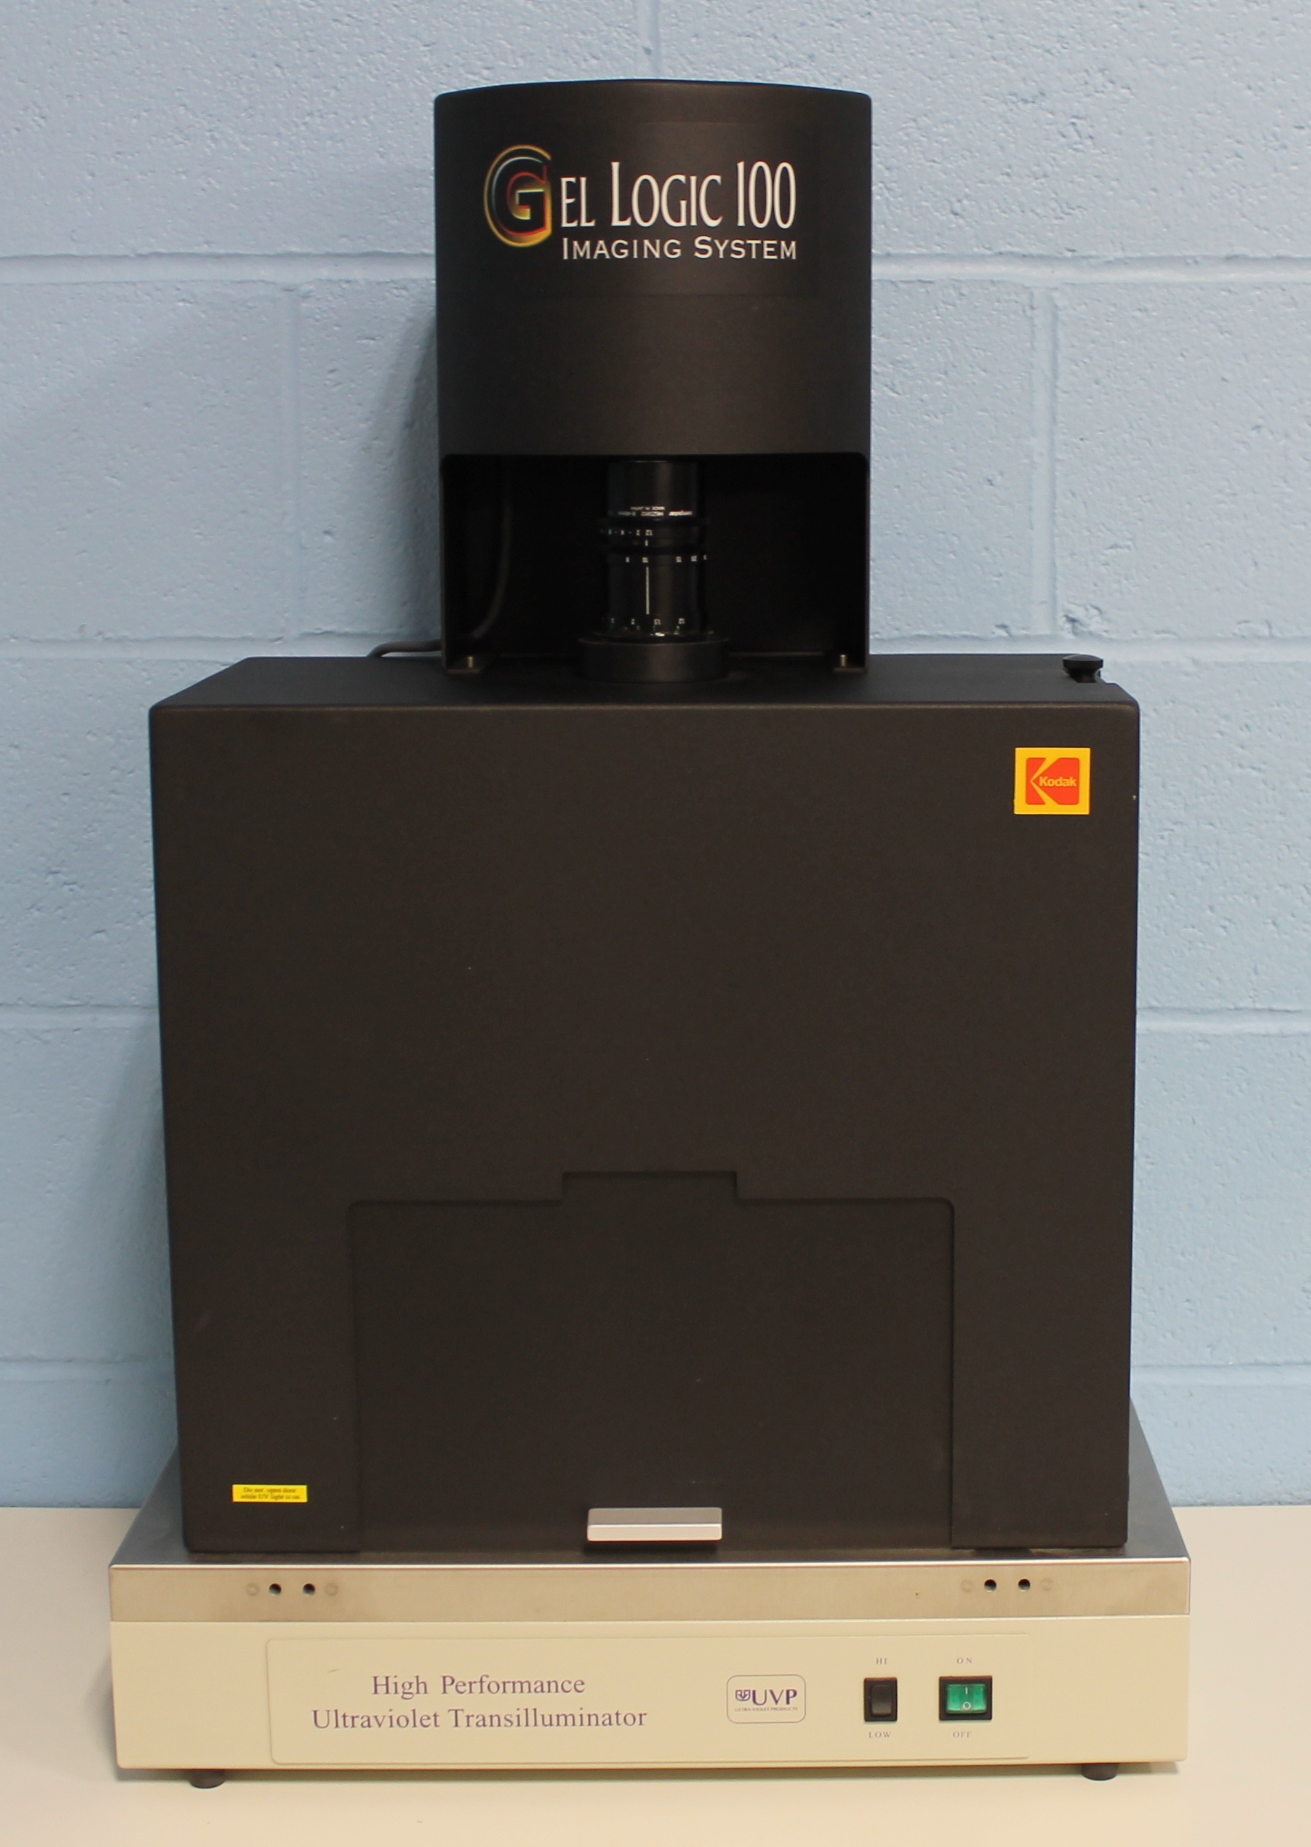 Refurbished Kodak Gel Logic 100 System